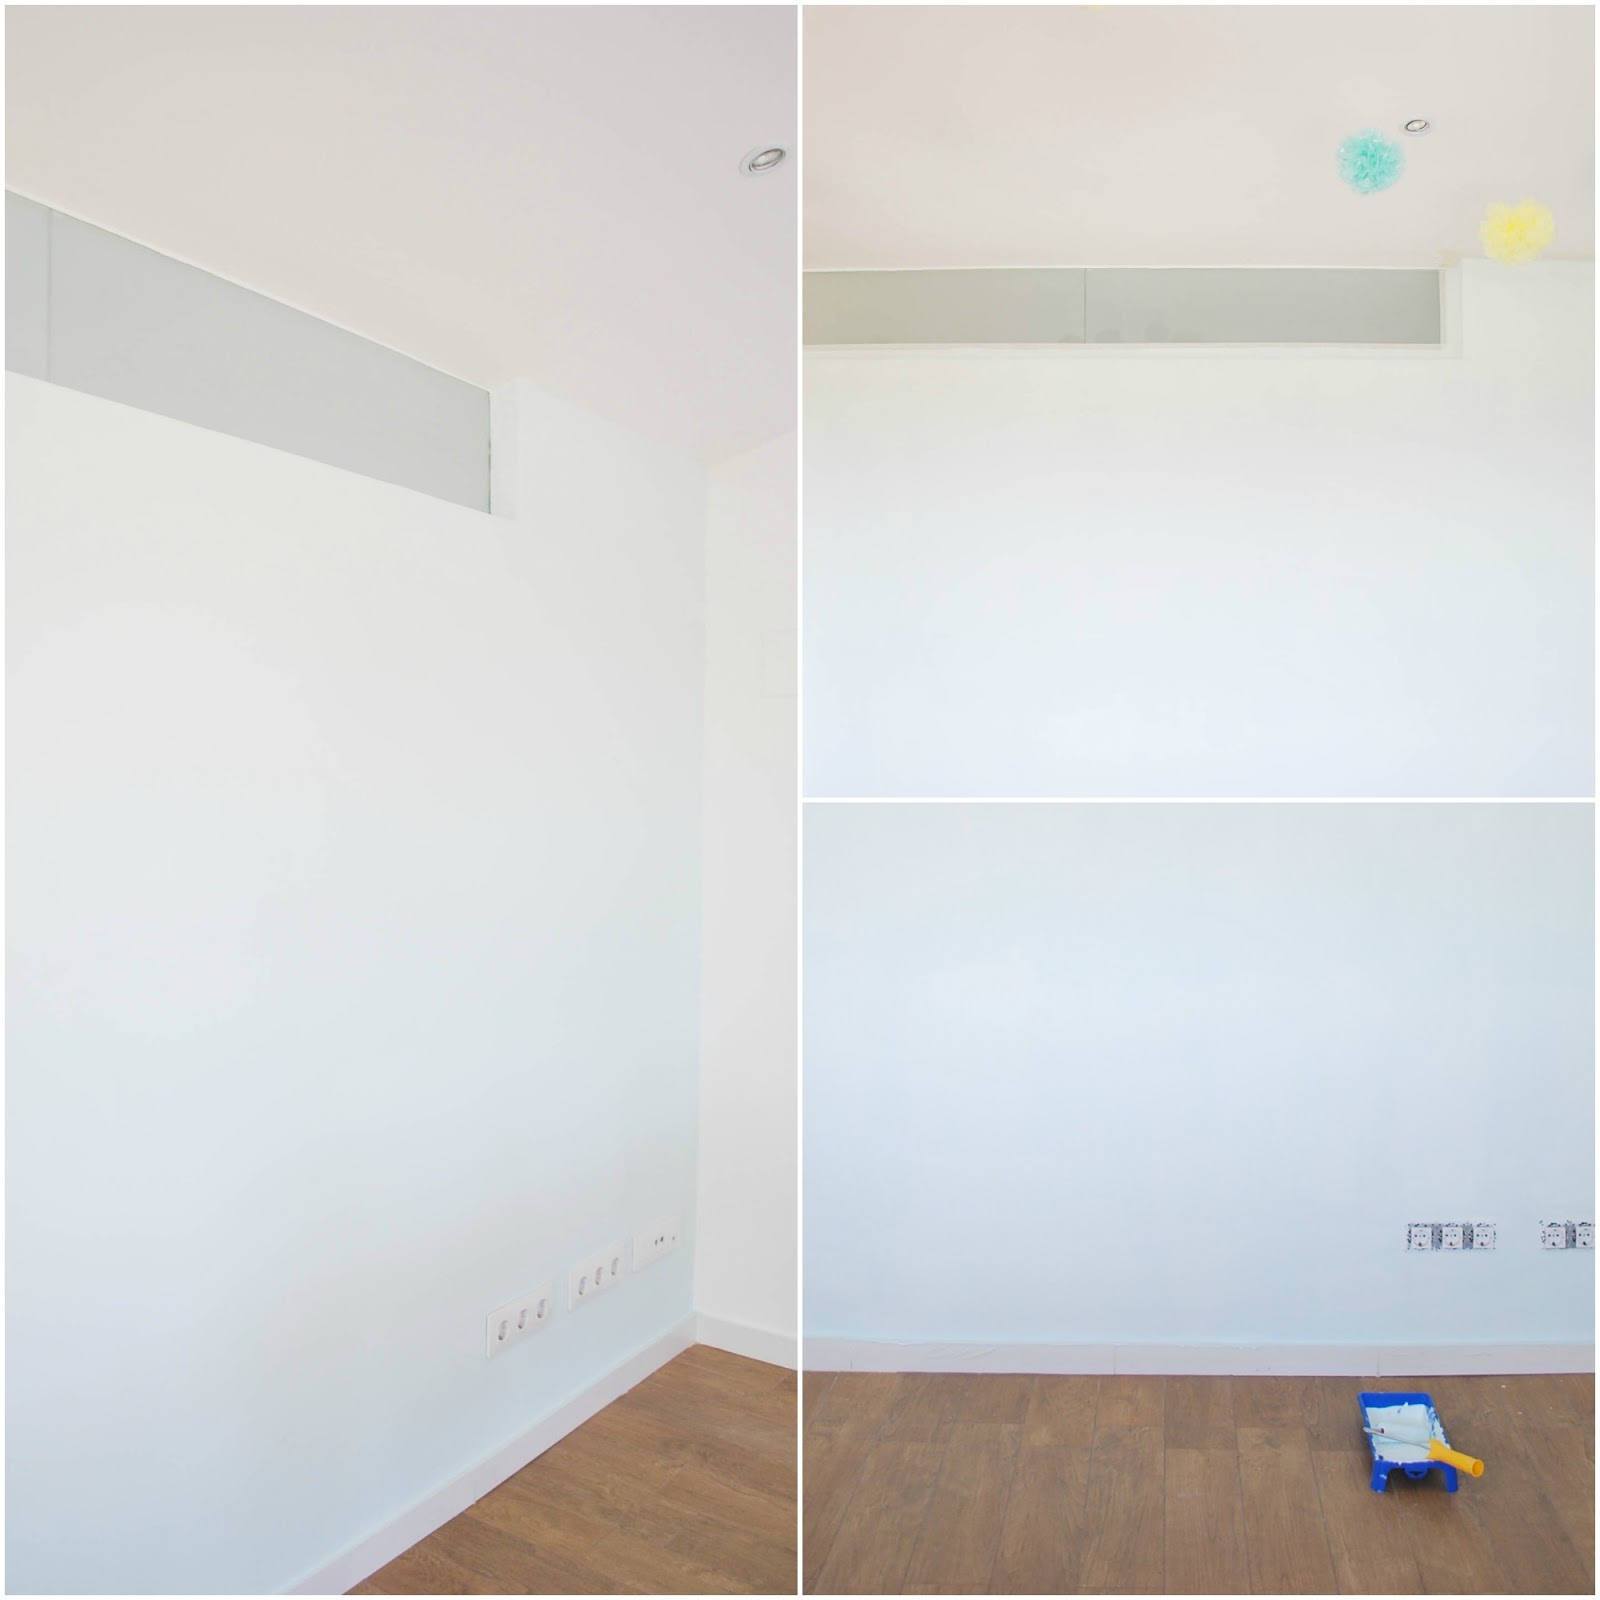 http://www.hommum.com/2014/05/my-home-mi-taller-nordico-paso-paso-i.html